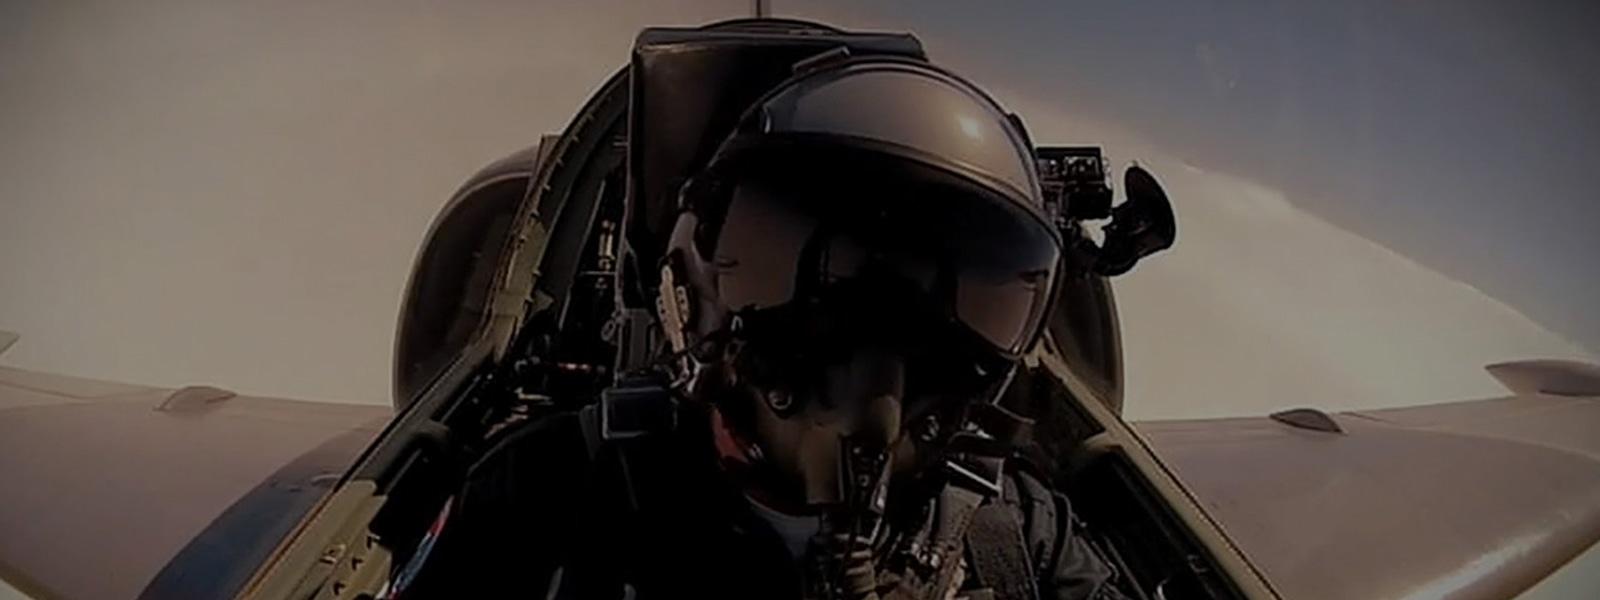 Pilot des US-Militärs